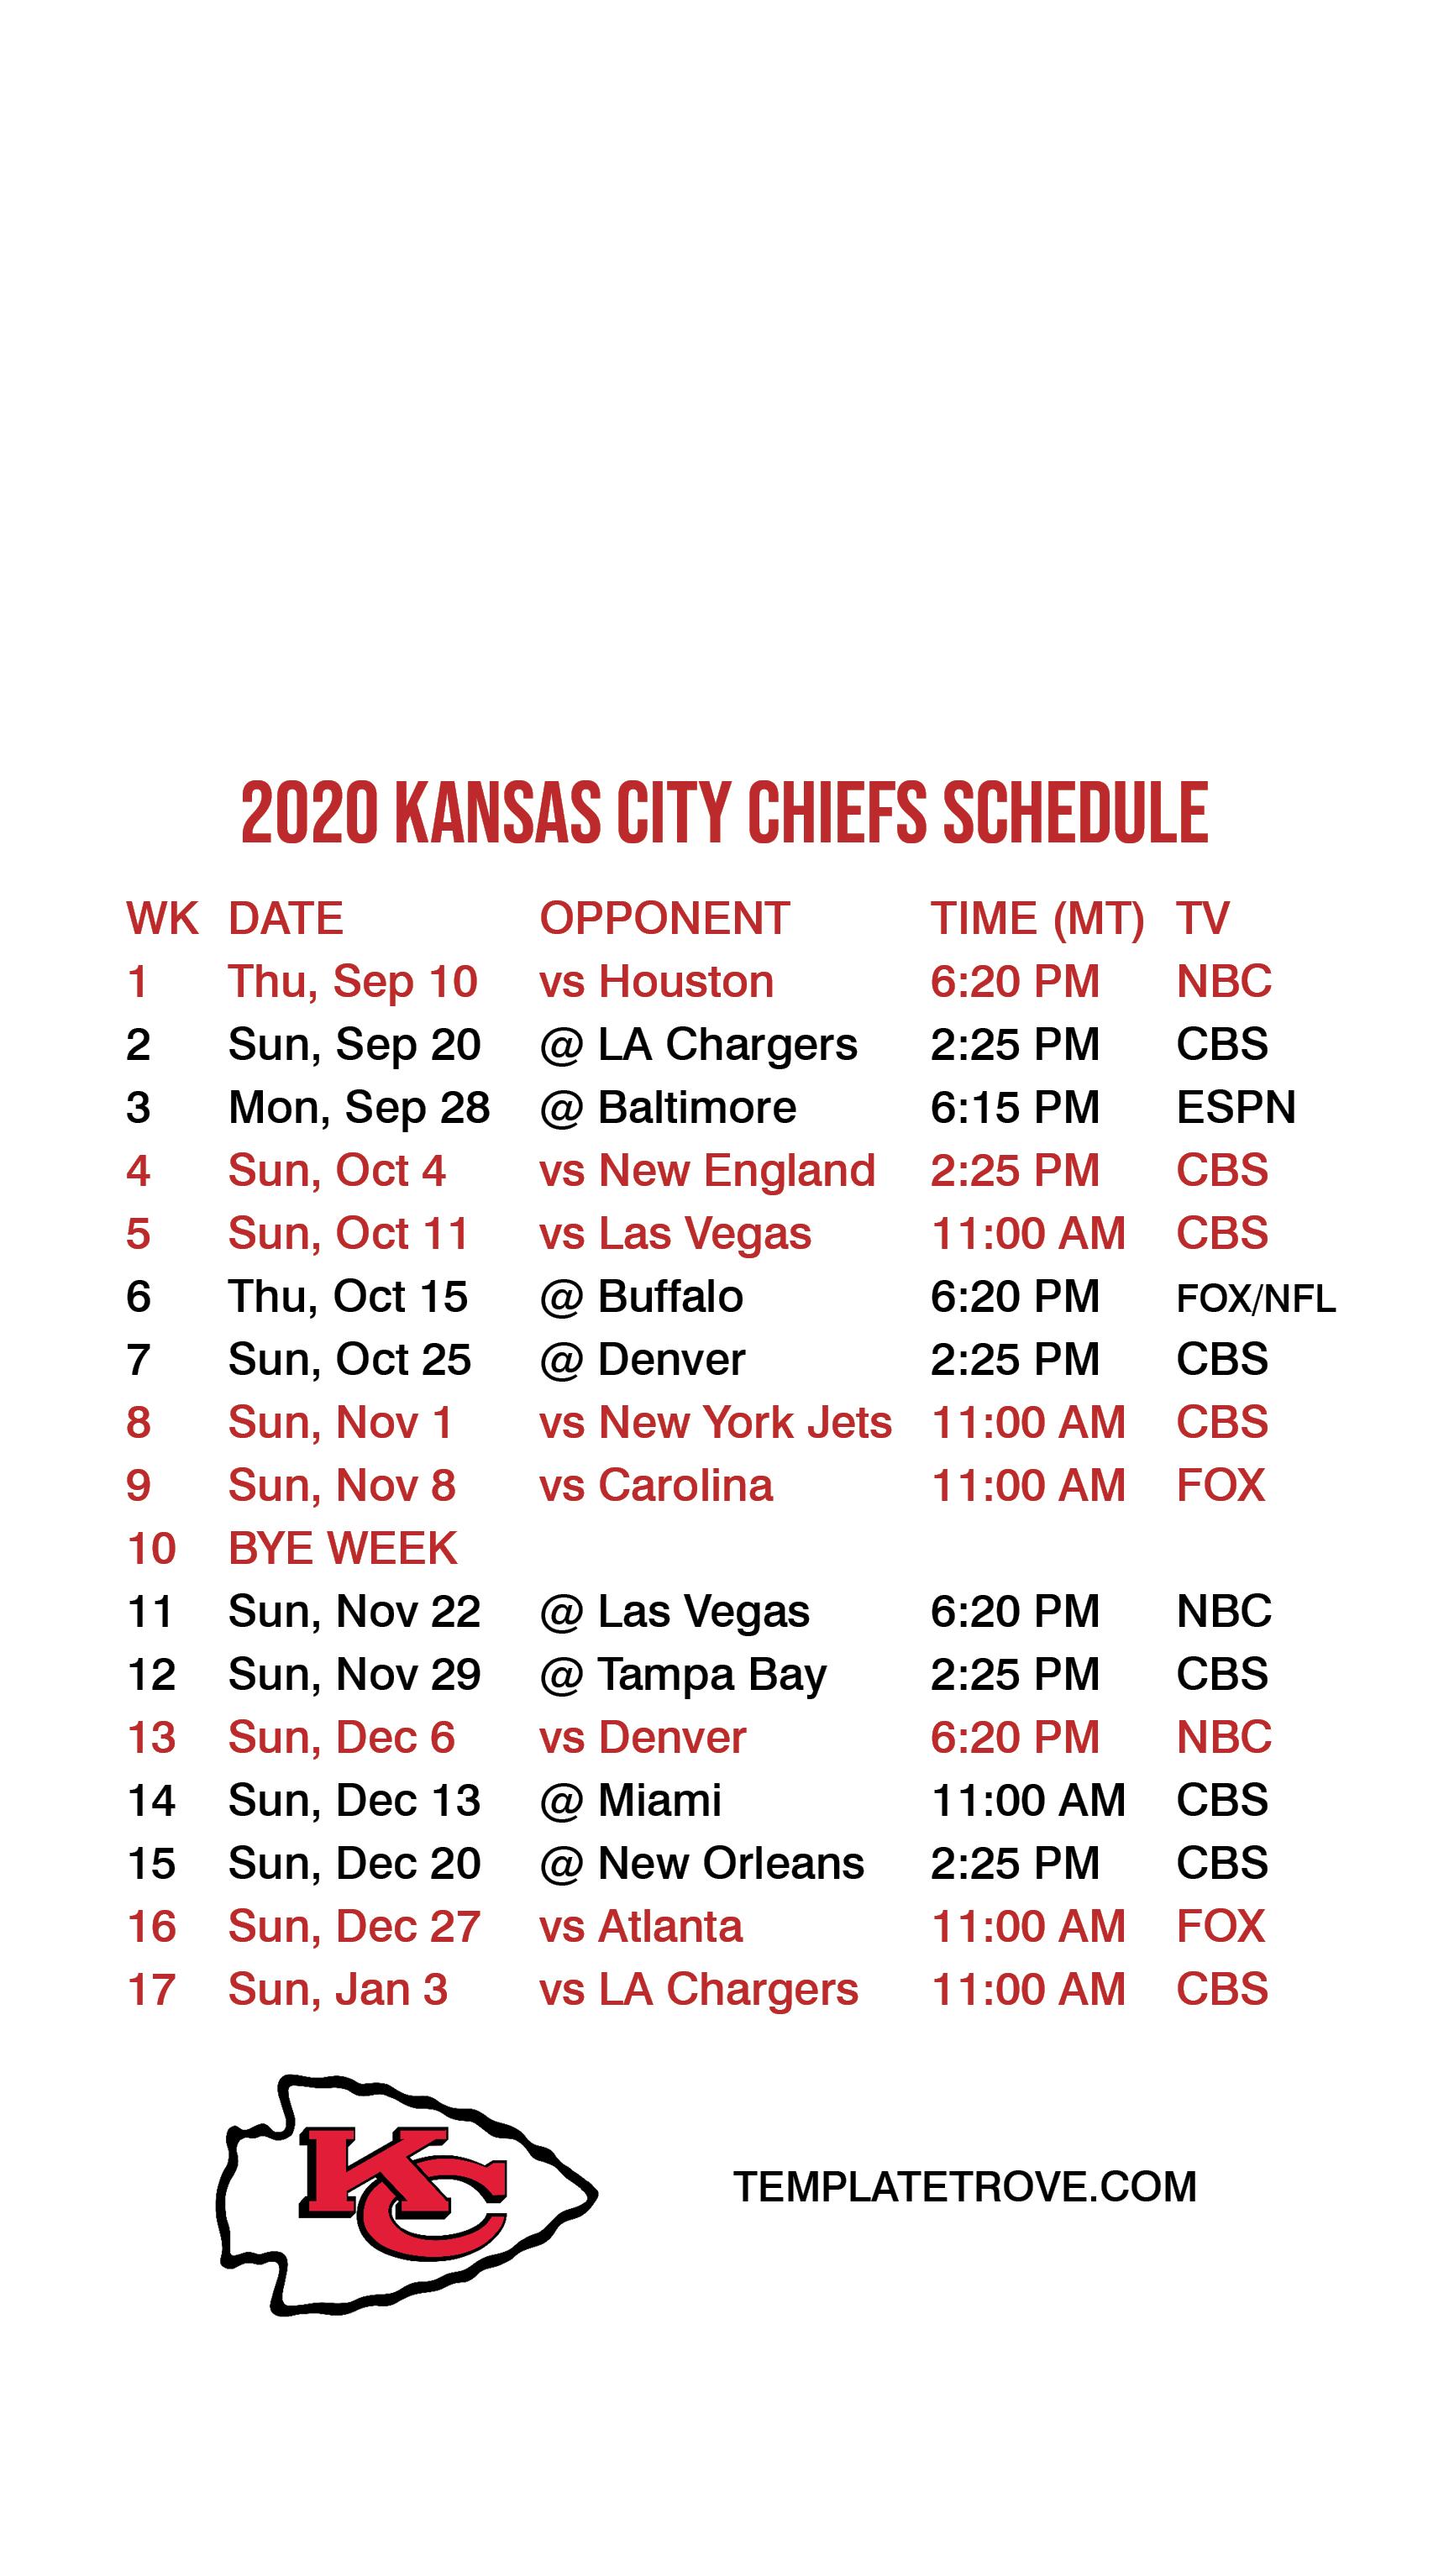 2020 2021 Kansas City Chiefs Lock Screen Schedule For